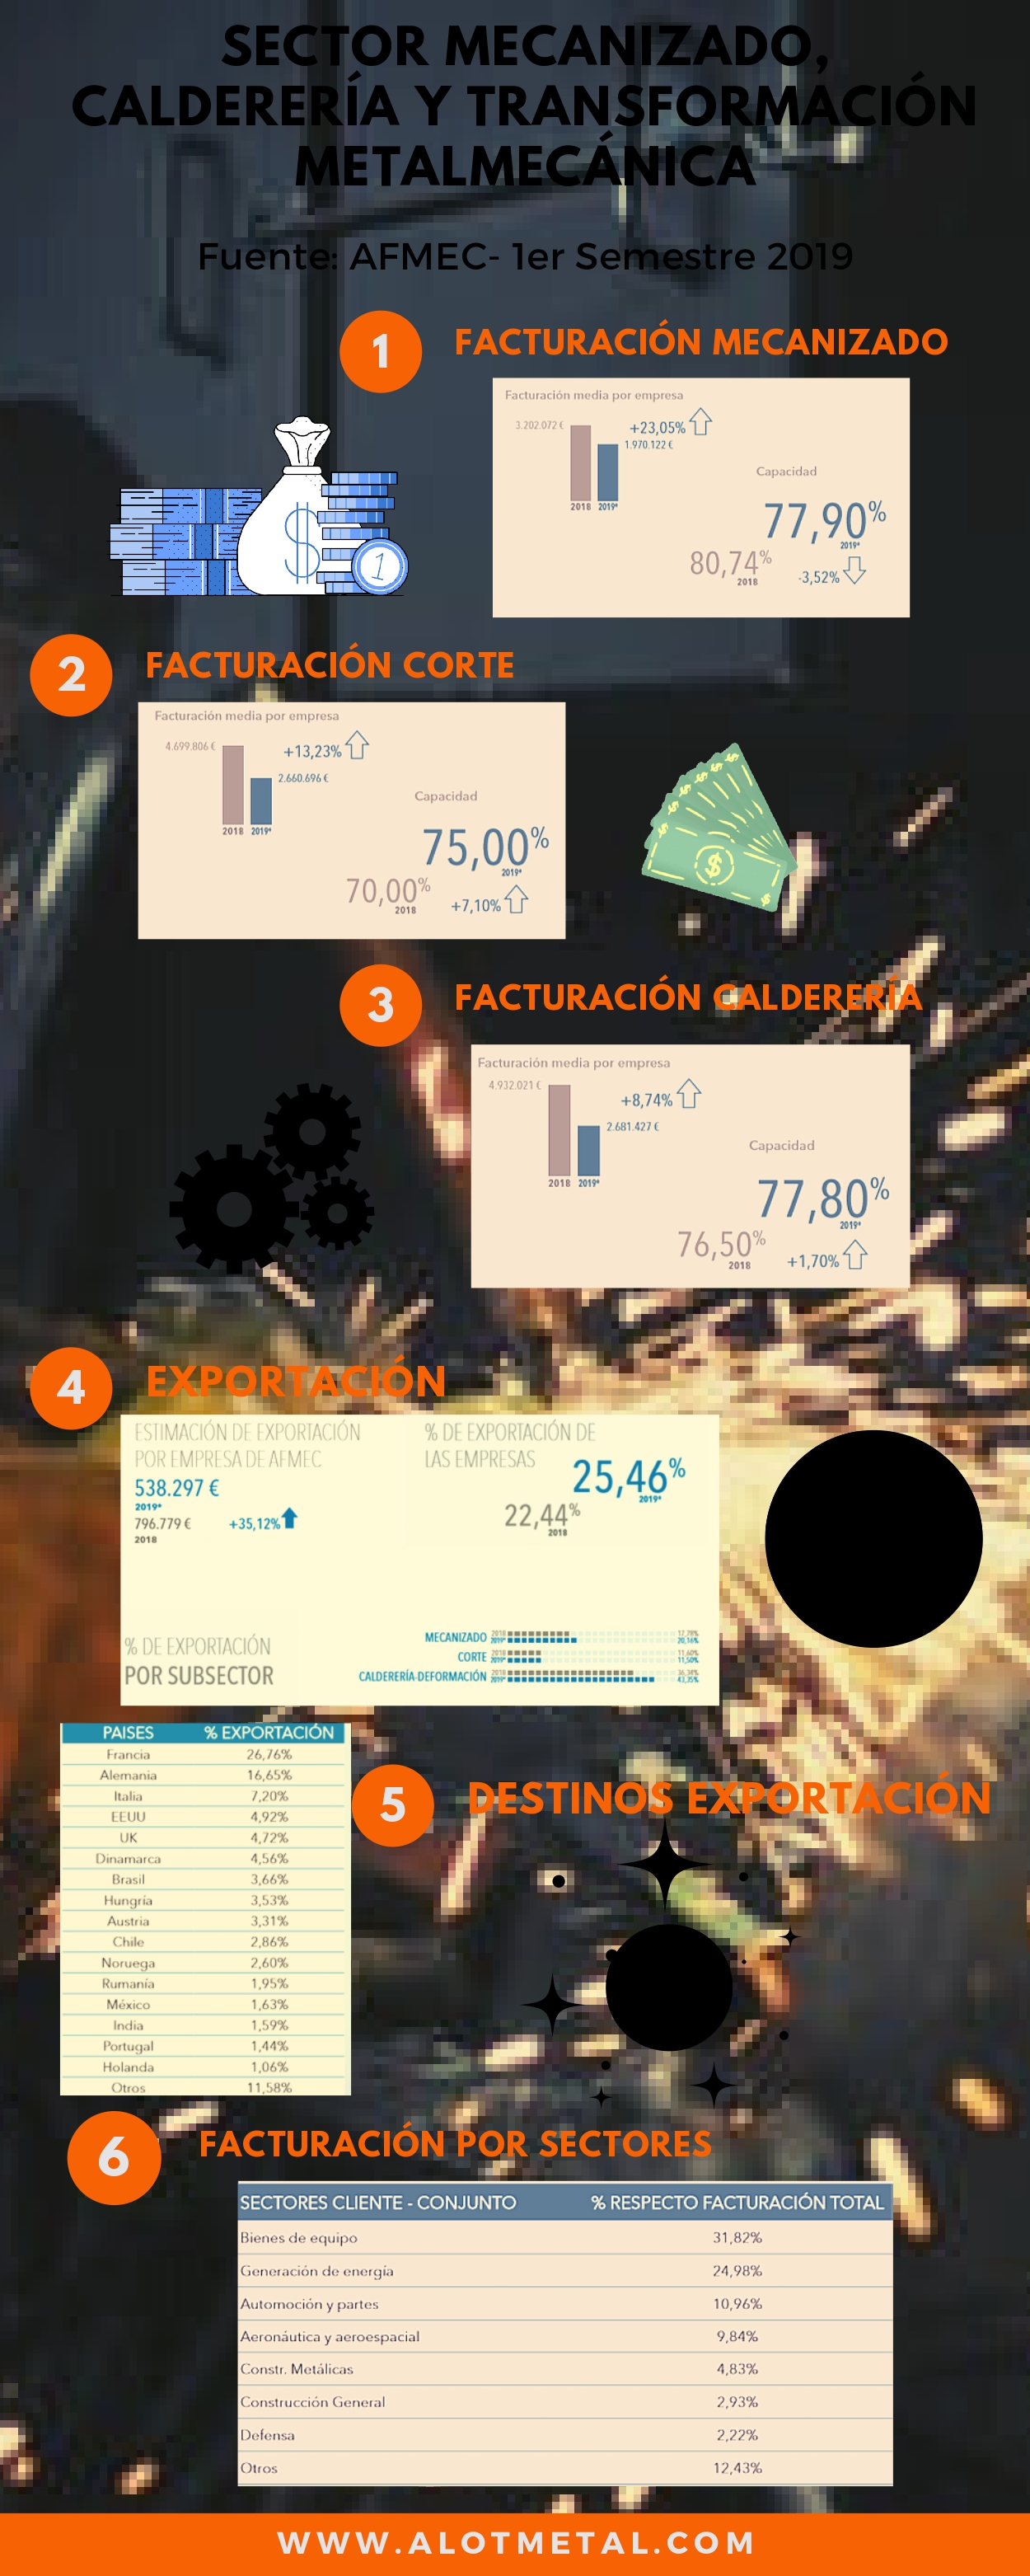 AFMEC- Sector Metalmecánico